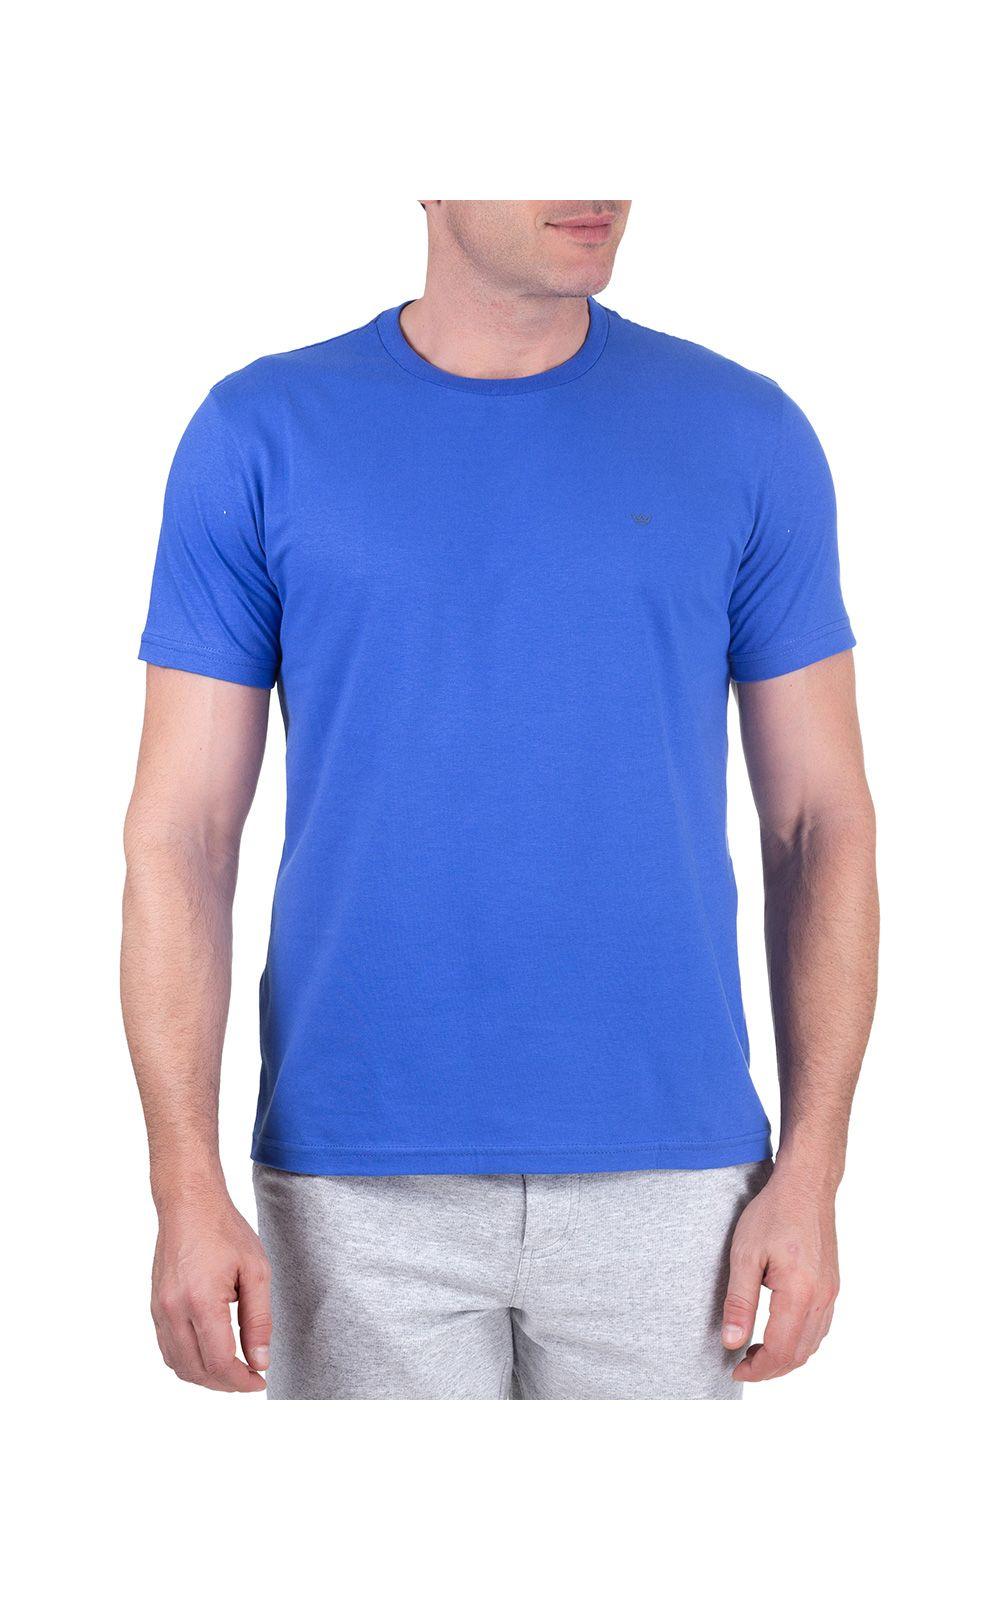 Foto 1 - Camiseta Masculina Azul Lisa